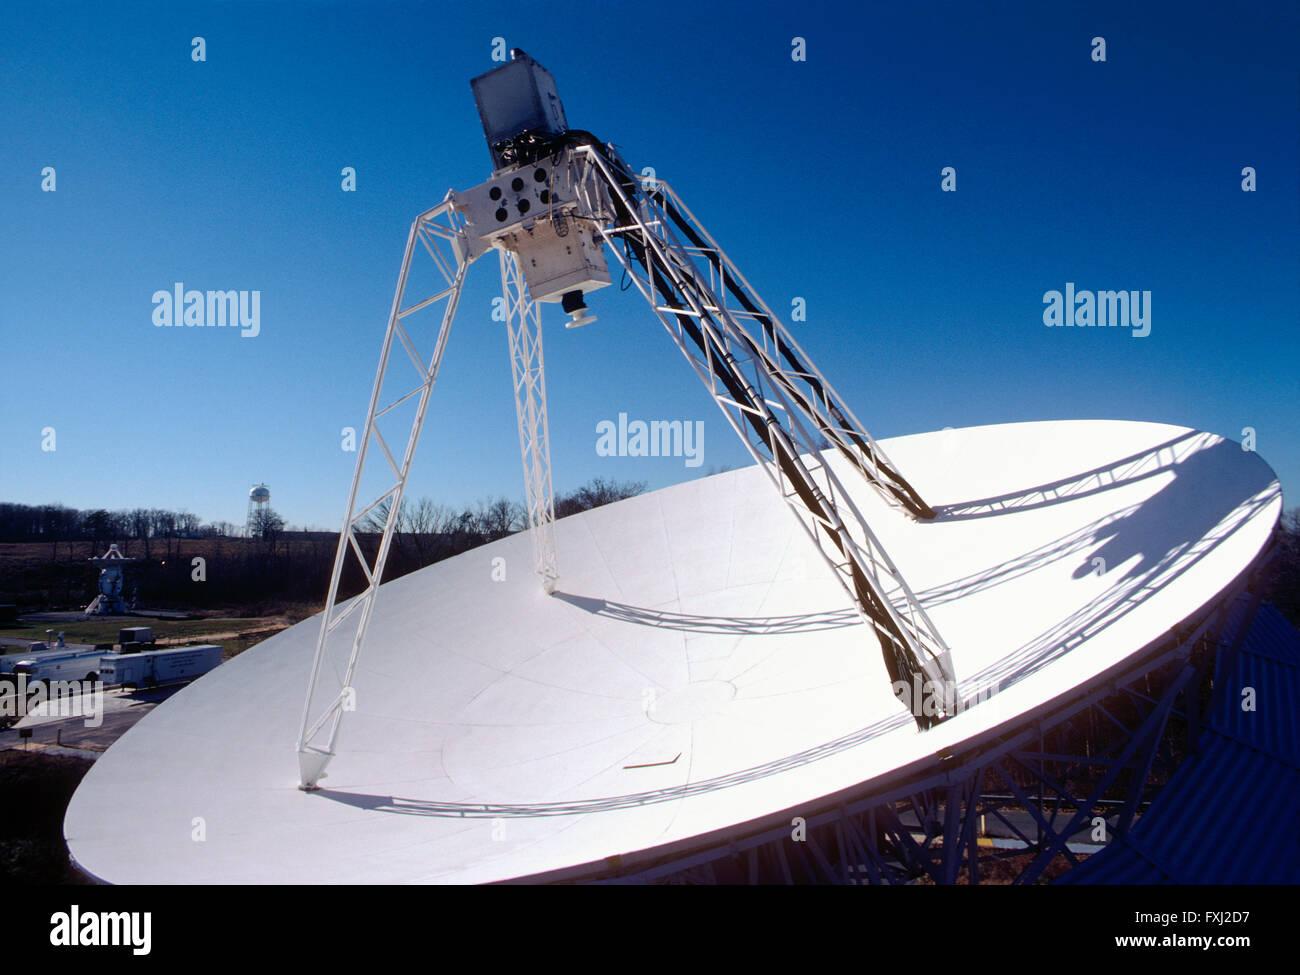 Telecommunications satellite dish at NASA facility outside of Washington, D.C., USA - Stock Image